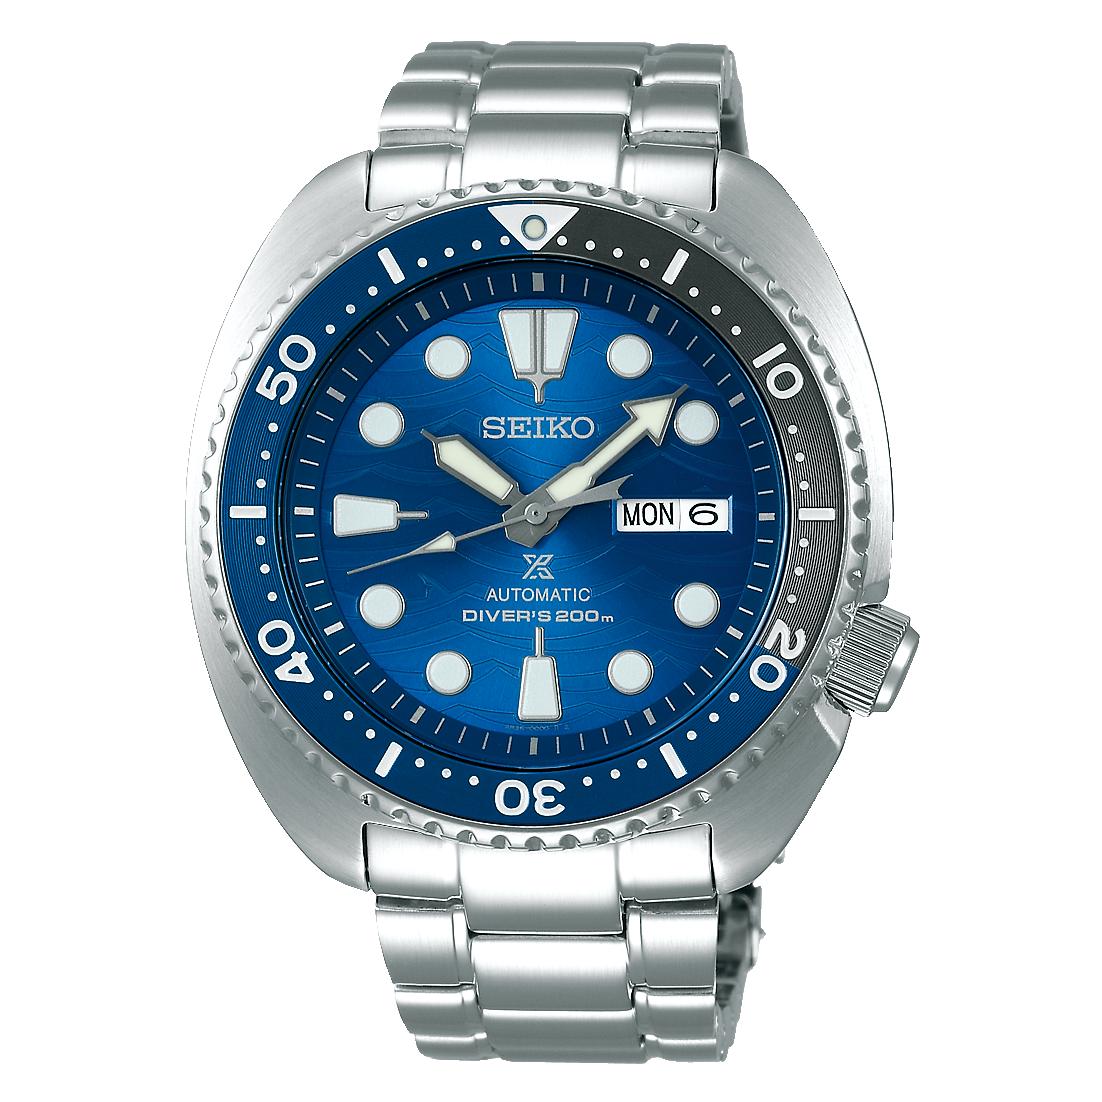 OROLOGIO SEIKO SRPD21K1 SAVE THE OCEAN GREAT WHITE SHARK